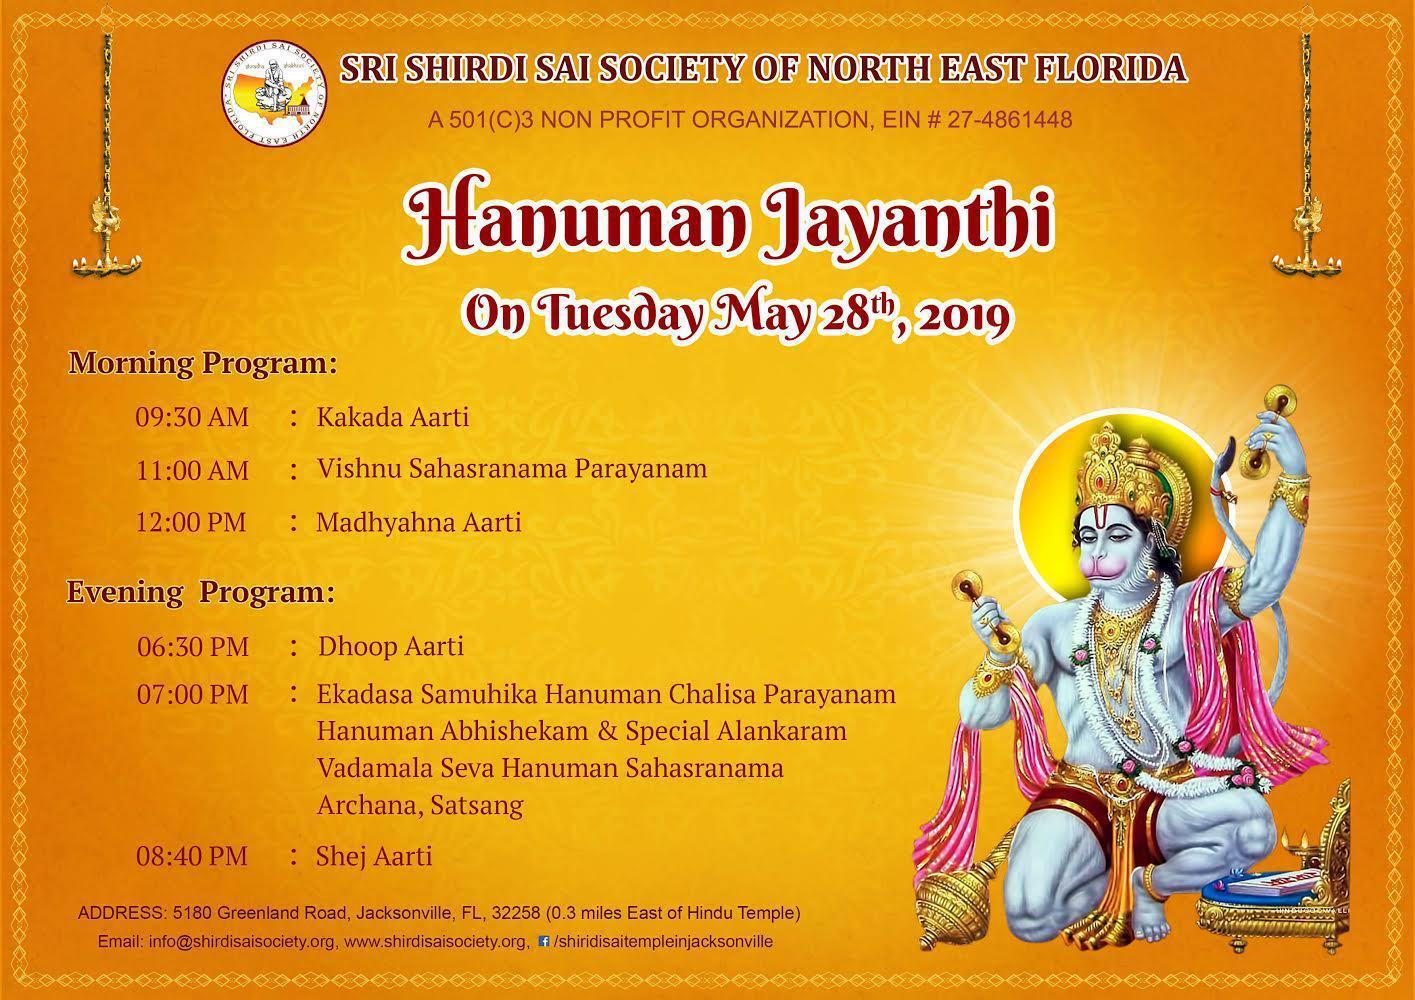 Sri Shirdi Sai Society of North East Florida : Old Events